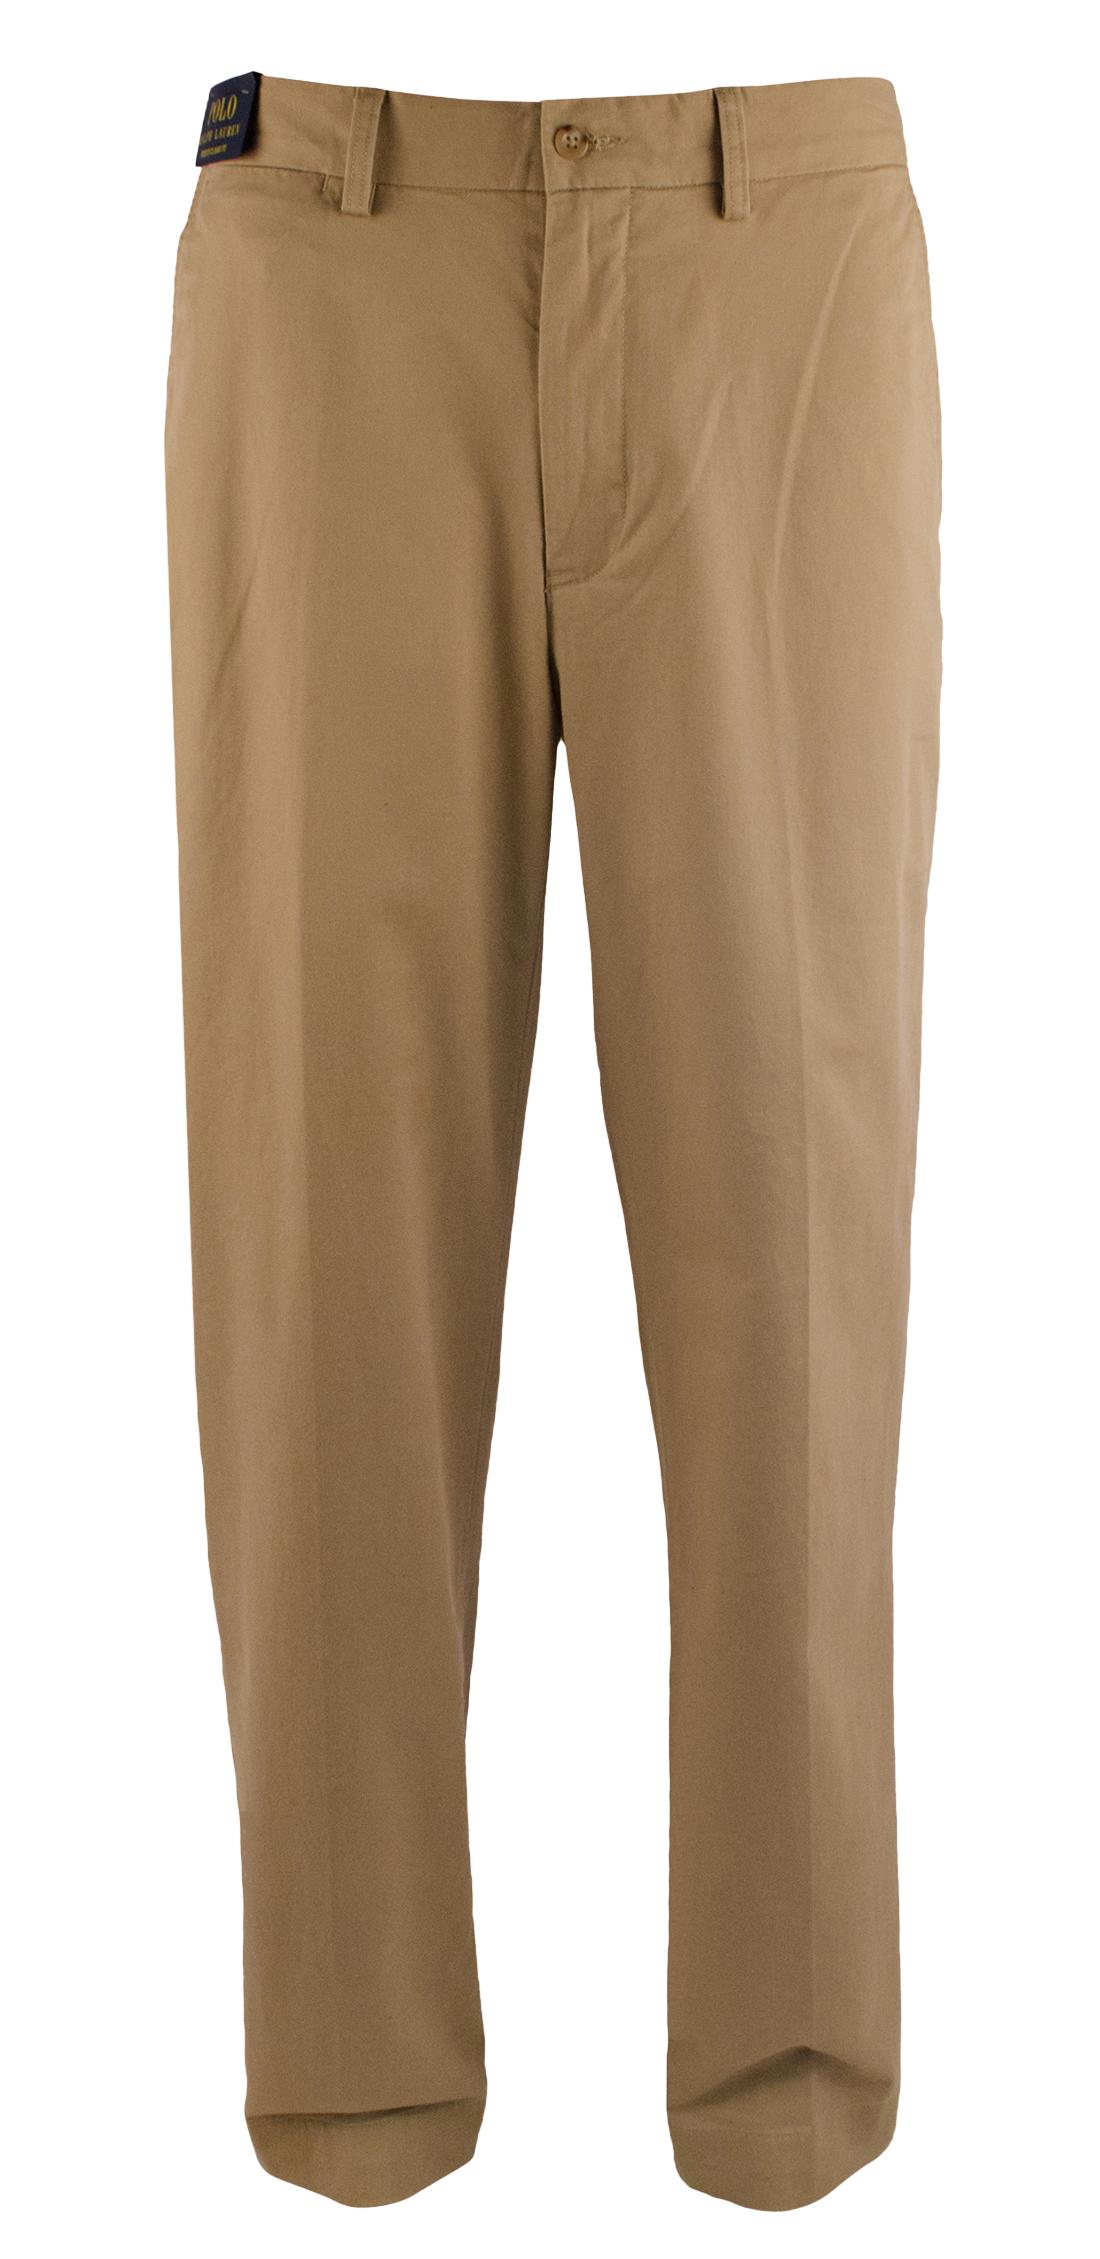 9f57c3e32c37 Polo Ralph Lauren Men s Big   Tall Classic Fit Chino Pants. Why BUY ...